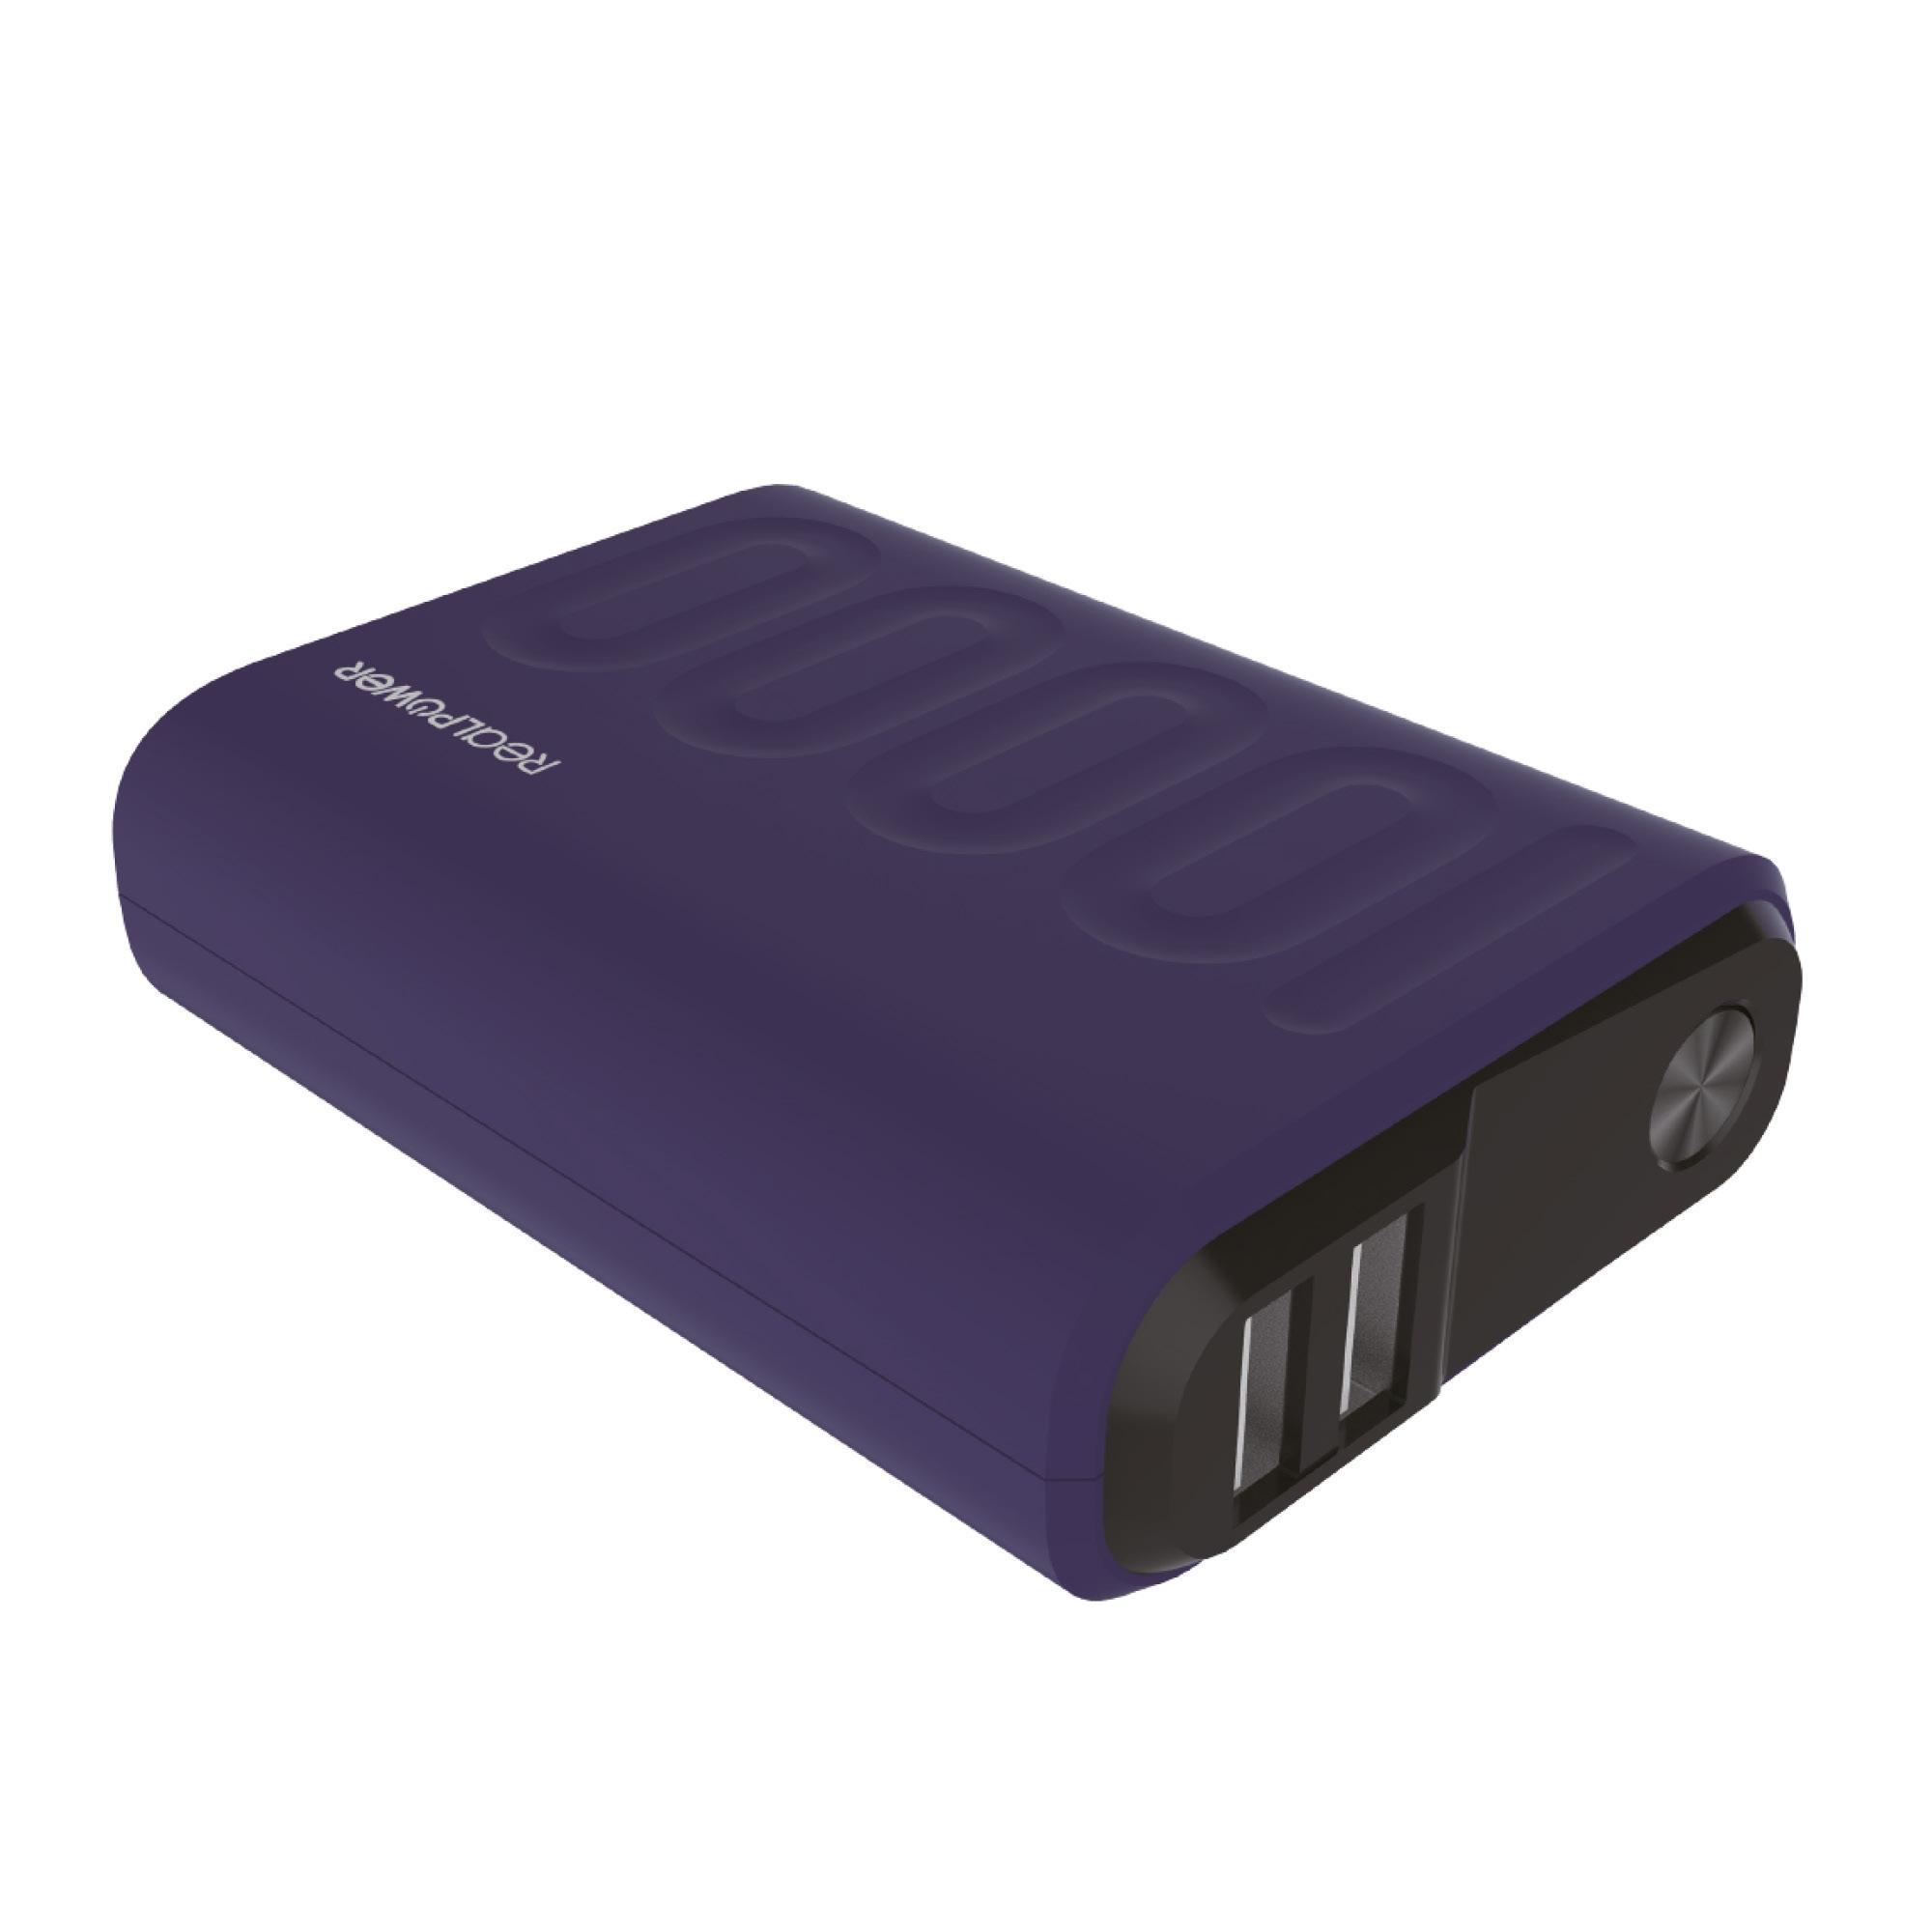 RealPower PB-10000PD - Navy - Universal - Rechteck - 10000 mAh - USB - 5 - 9 - 12 V